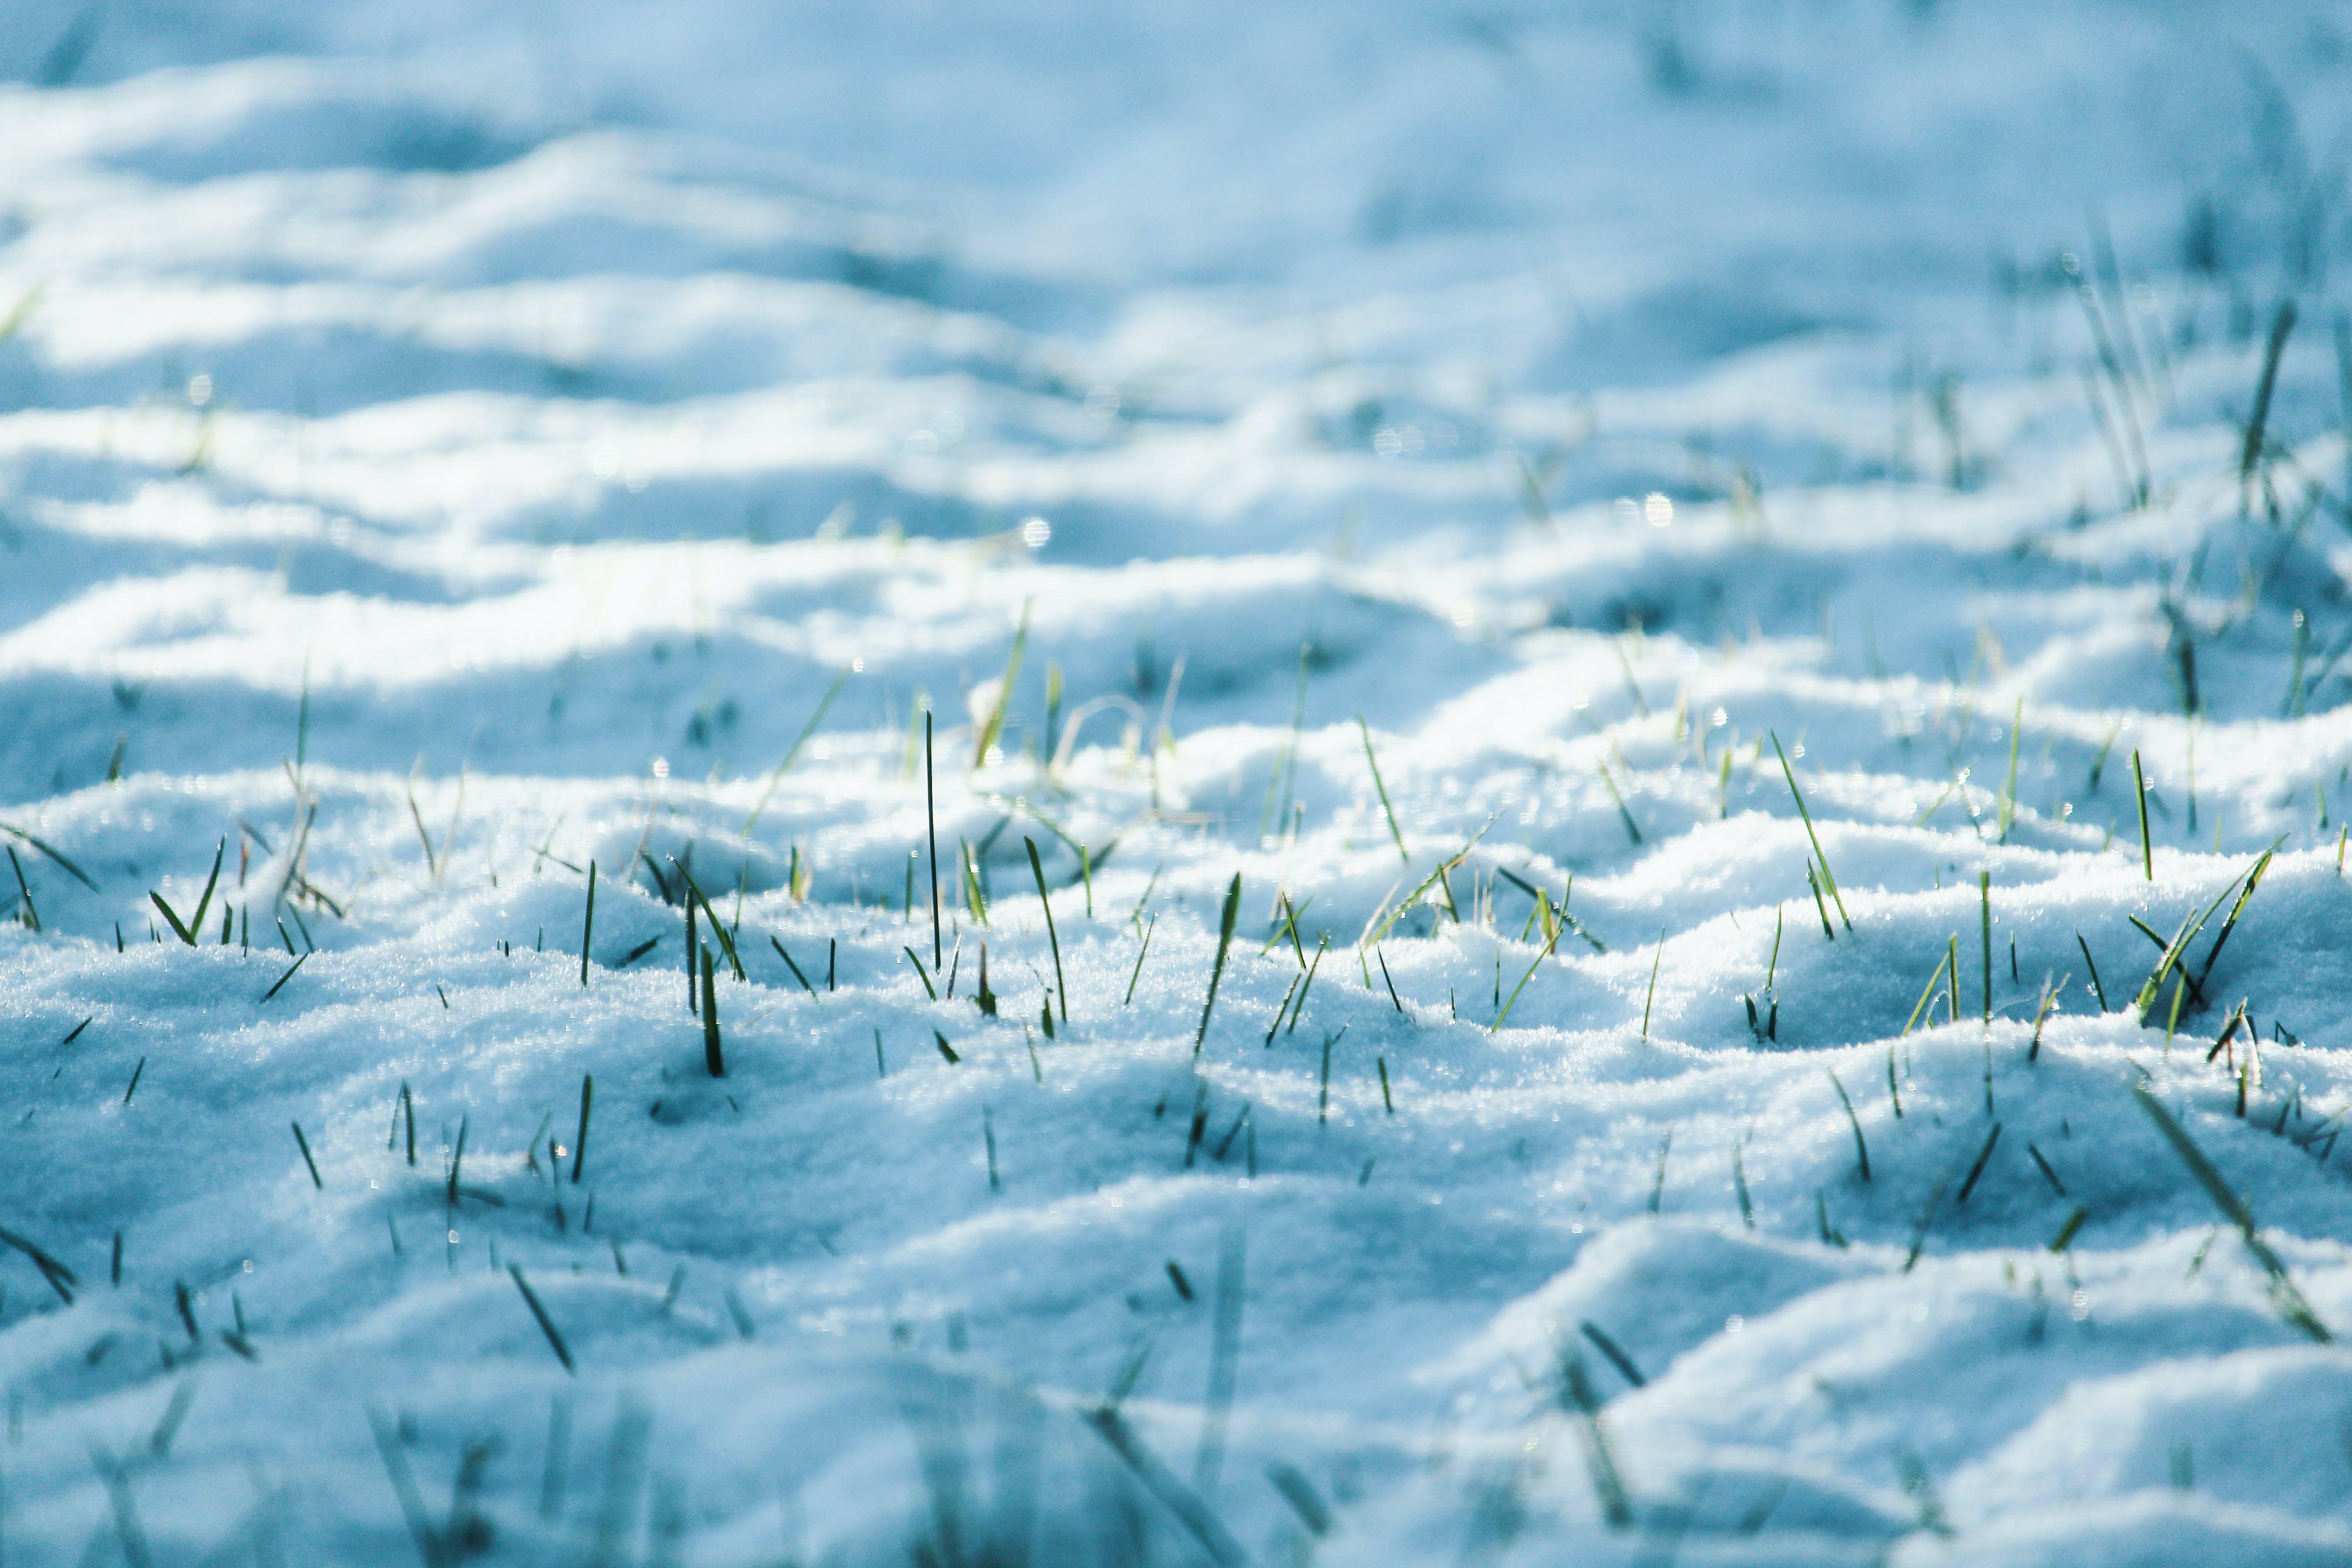 Close-Up Photo of Snow